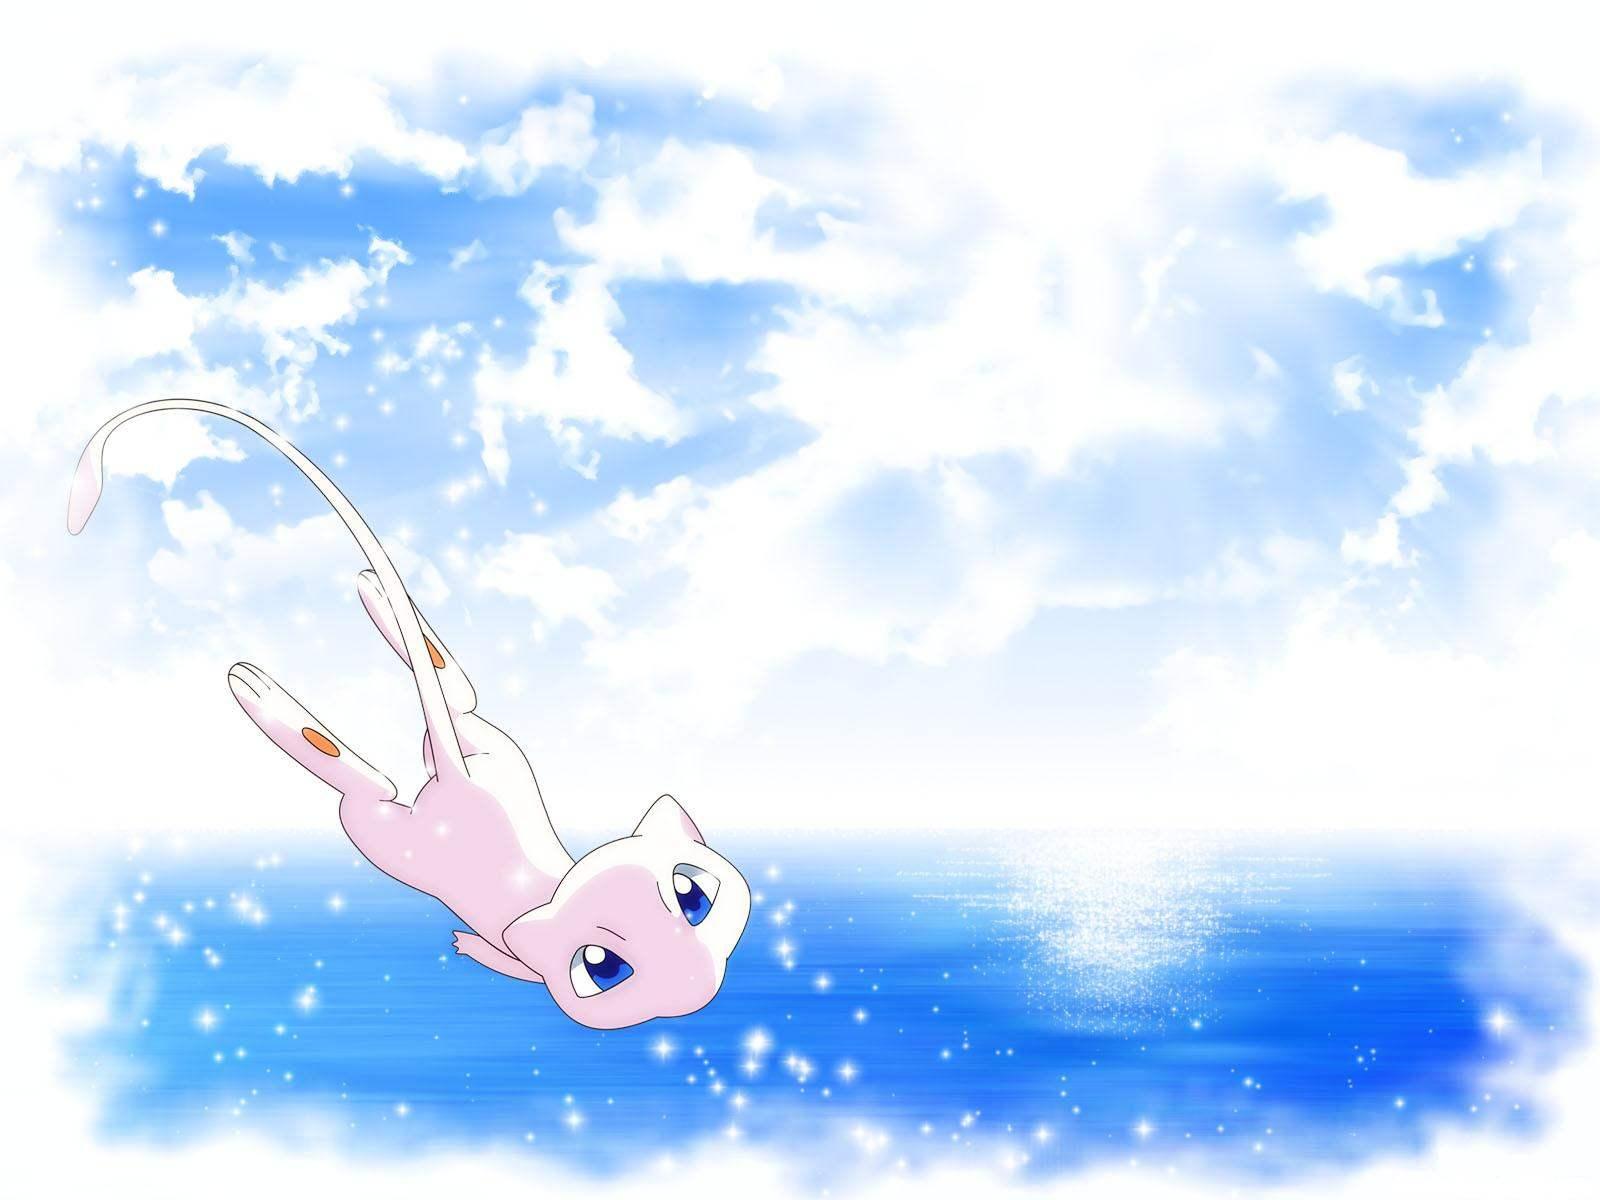 Download the Pokemon anime wallpaper titled Mew 2 1600x1200